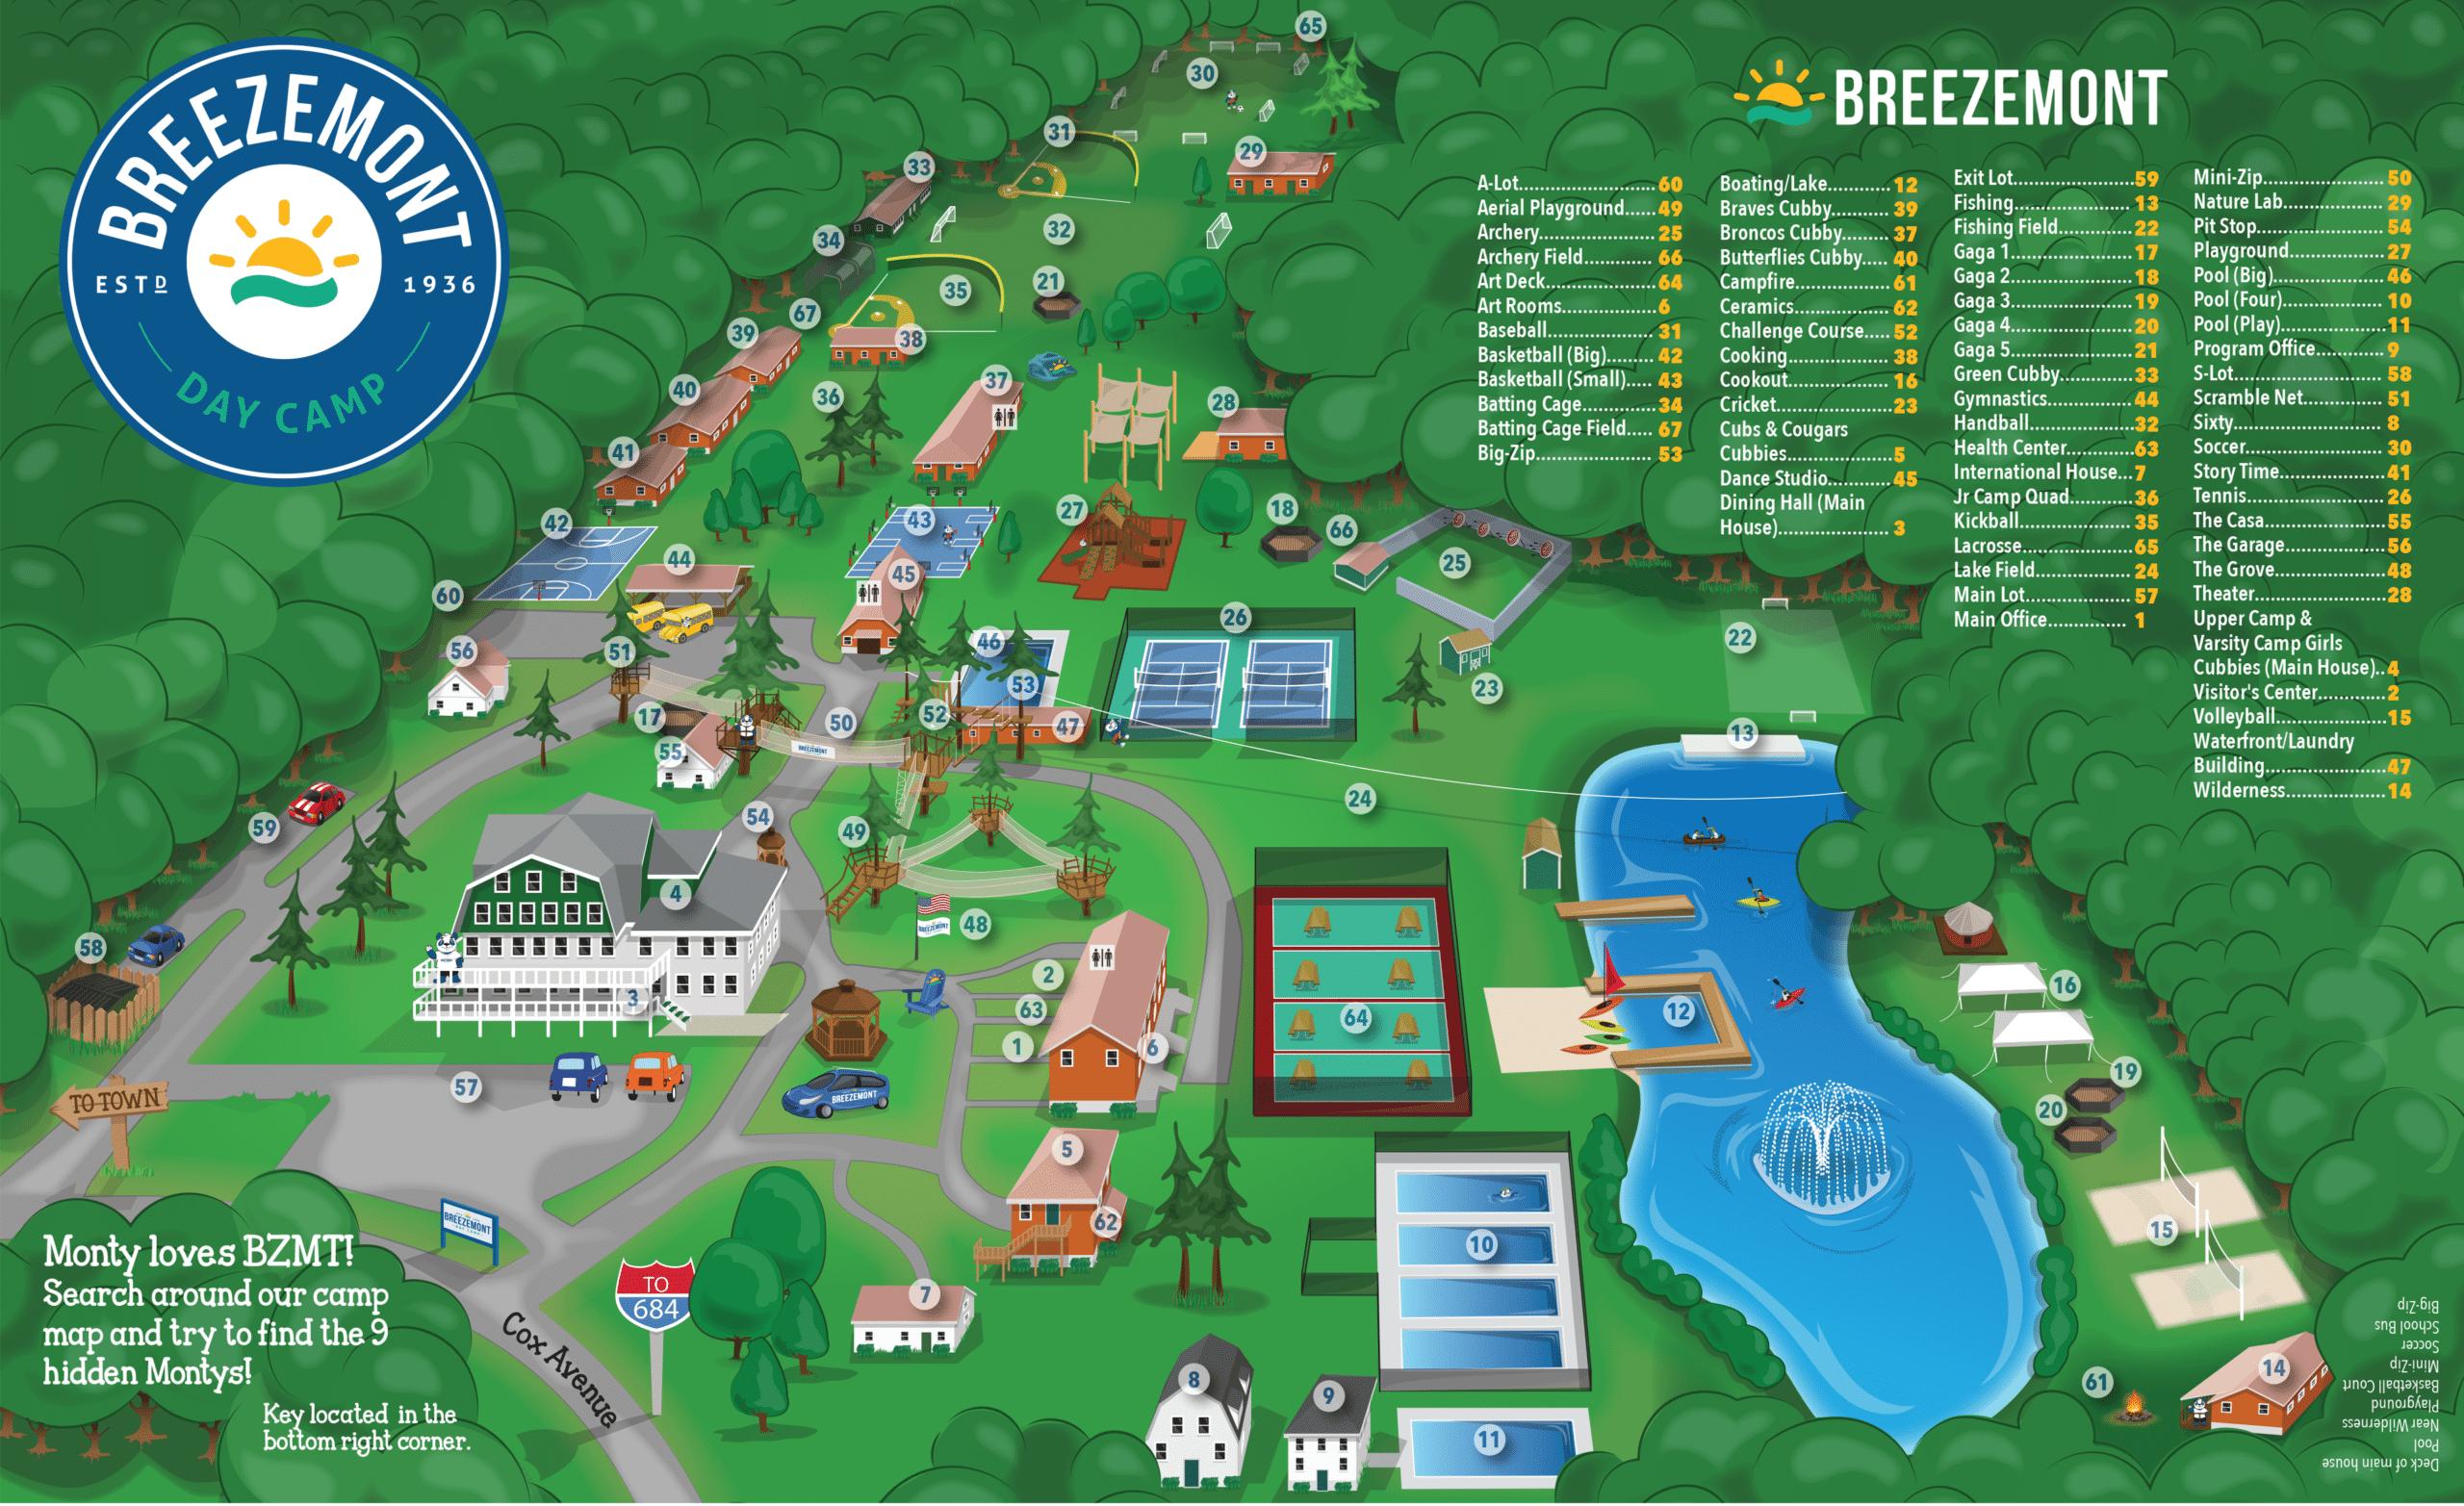 Breezemont camp map.